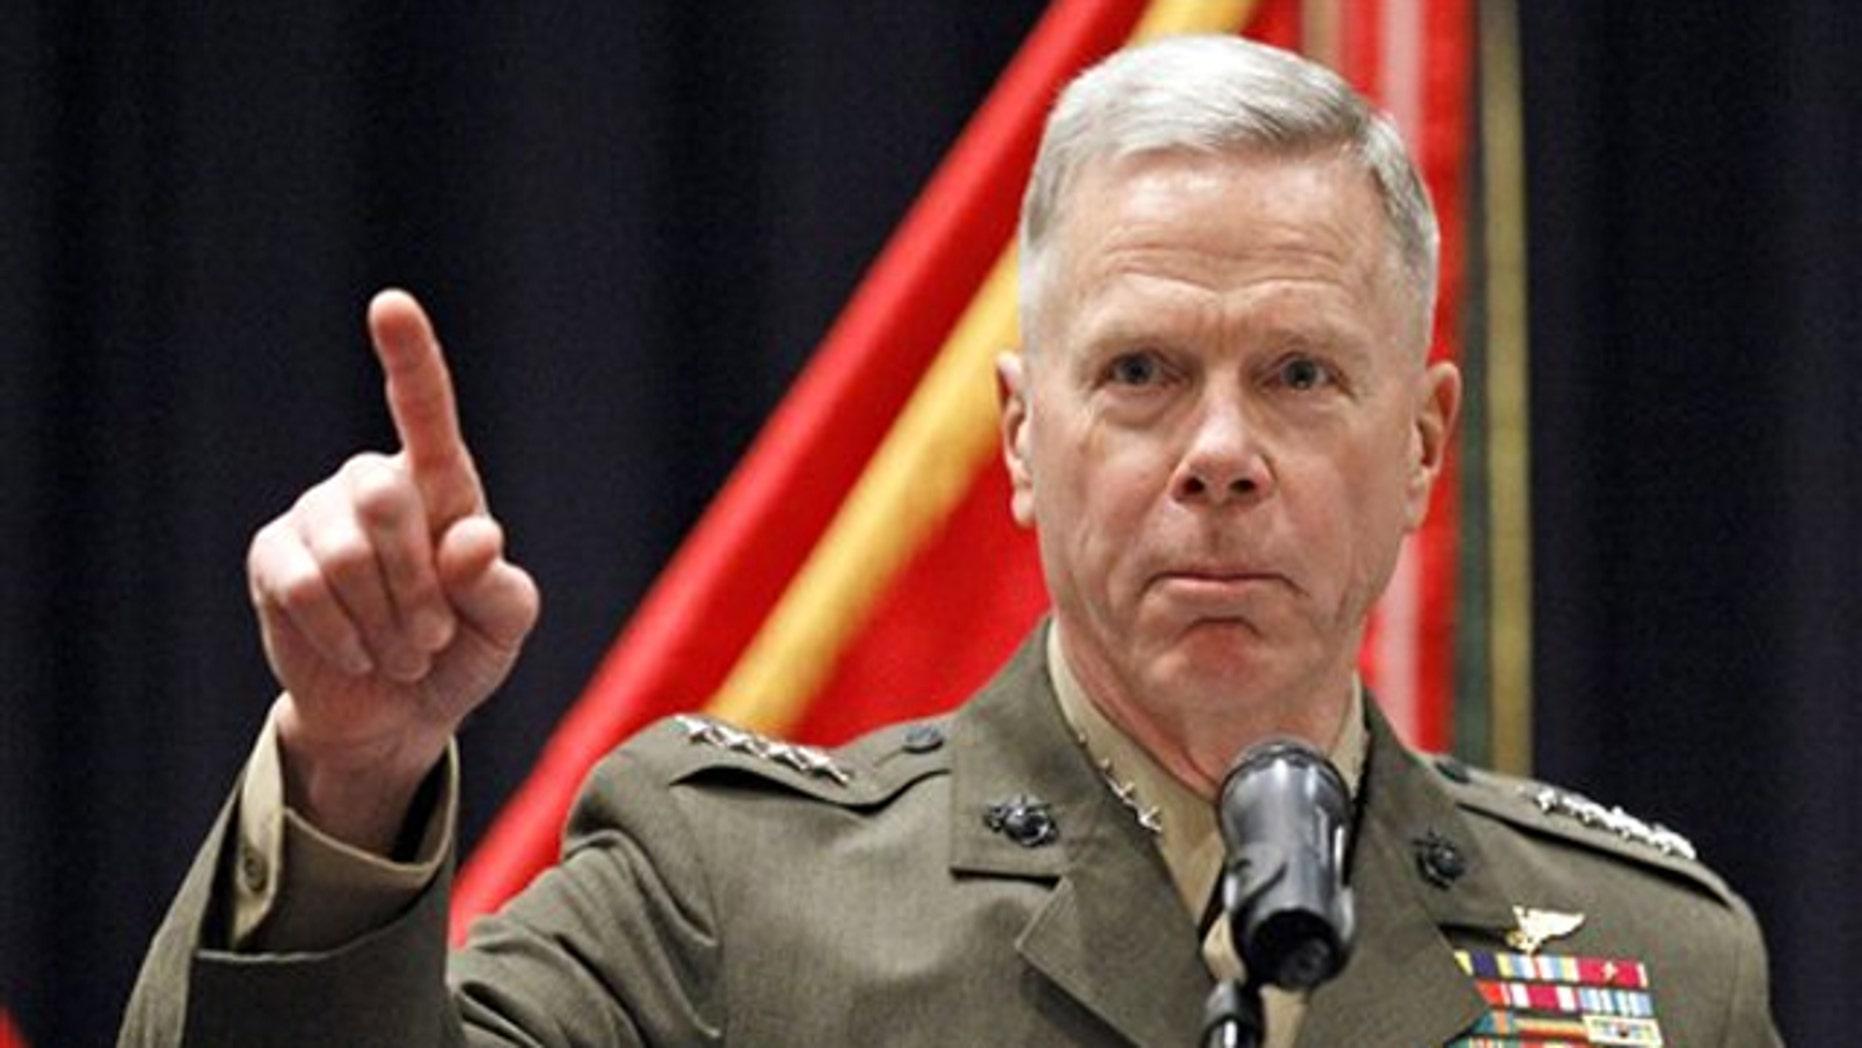 Dec. 1, 2010: Marine Corps Commandant Gen. James Amos speaks at the Marine Corps Barracks in Washington.